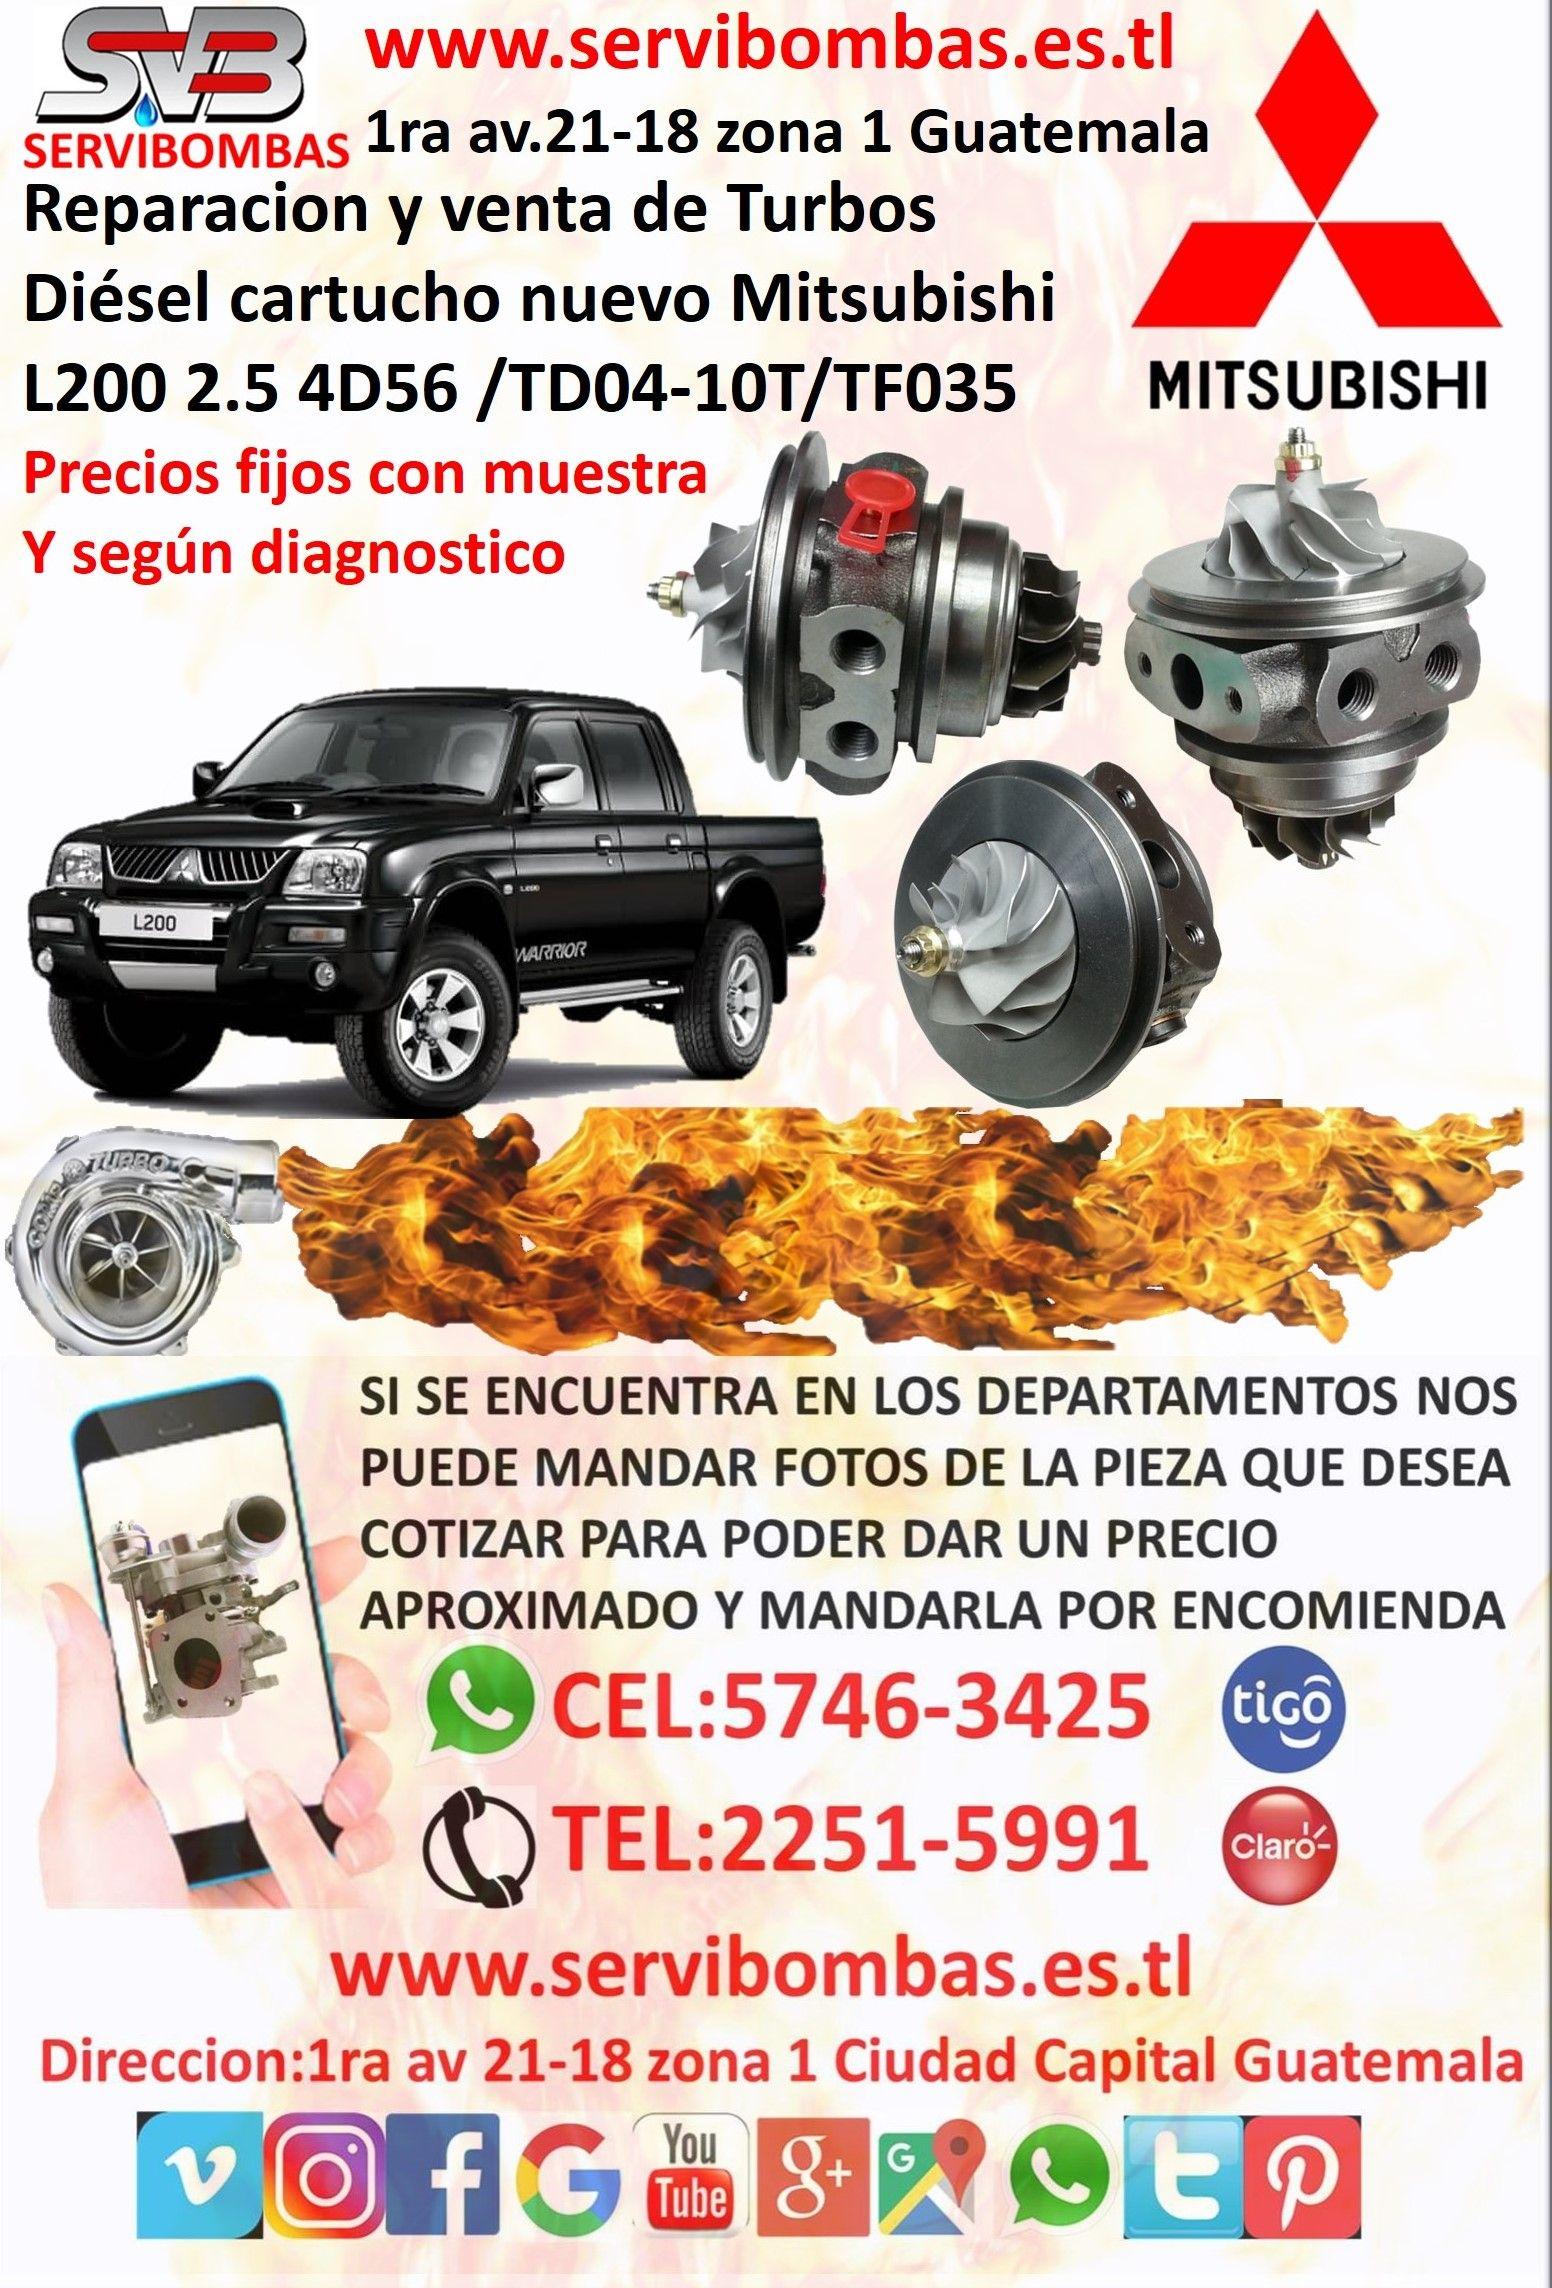 Compro Mitsubishi L200 En Guatemala Servibombas Cartucho Nuevo Turbo Mitsubishi L200 4d56 2 5 Tf035